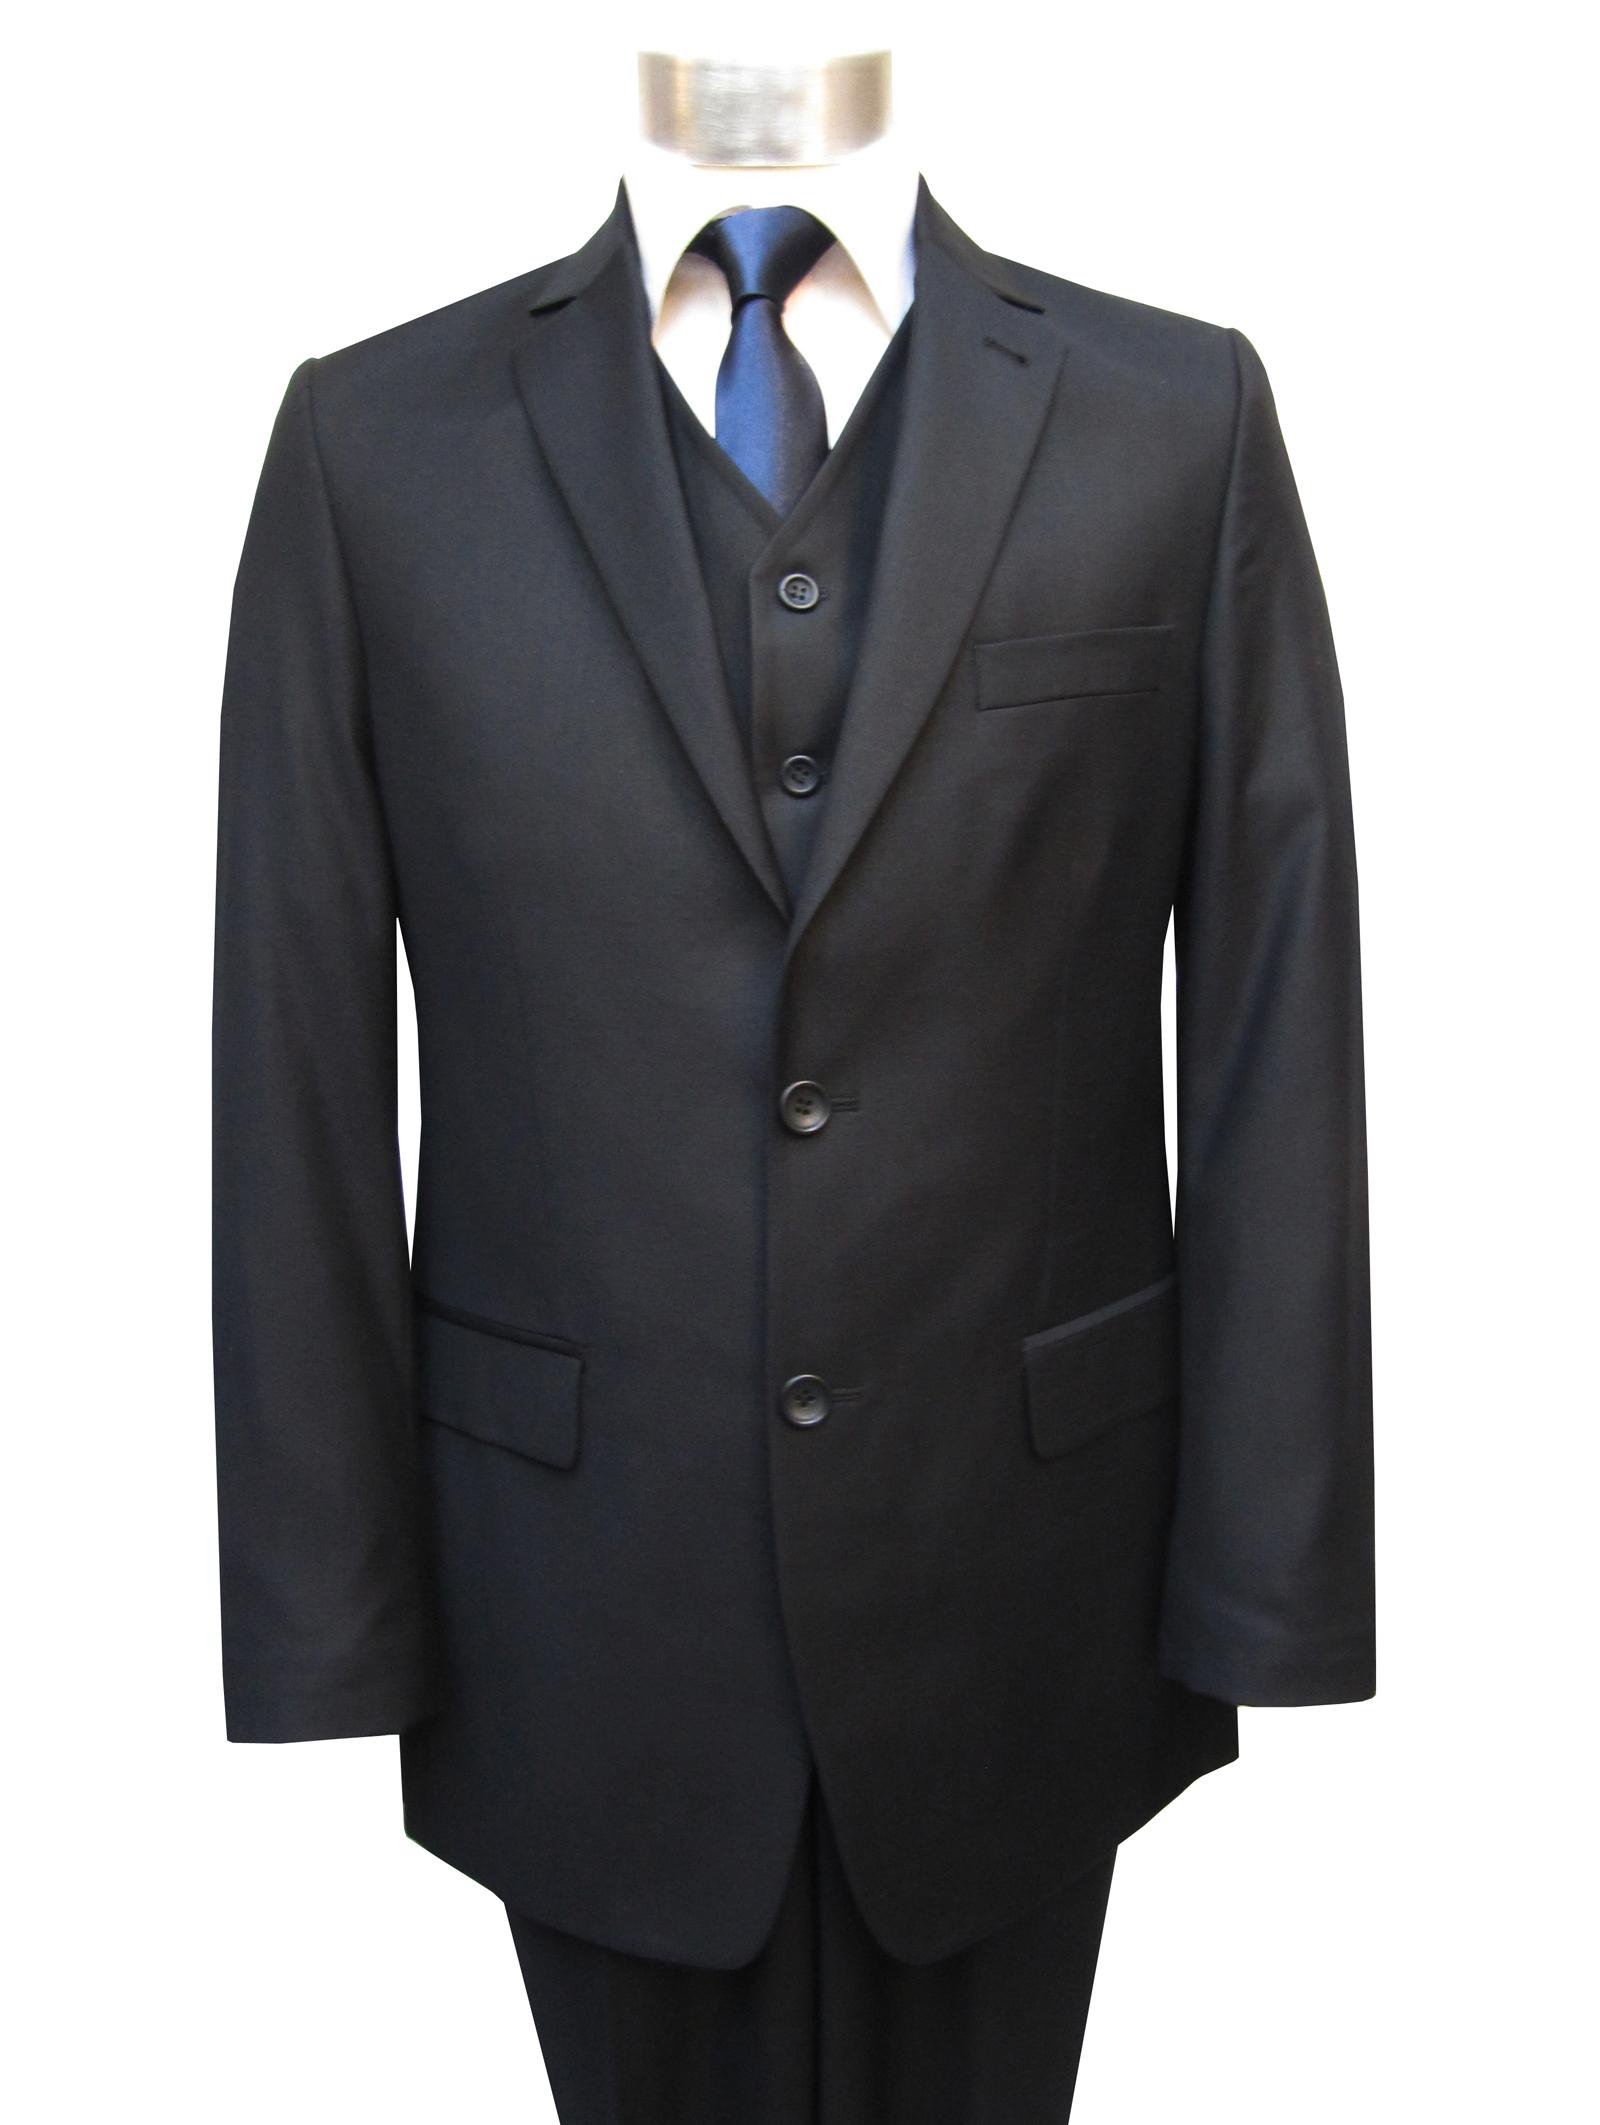 elegante herren anzug 3 teilig dunkelblau ebay. Black Bedroom Furniture Sets. Home Design Ideas